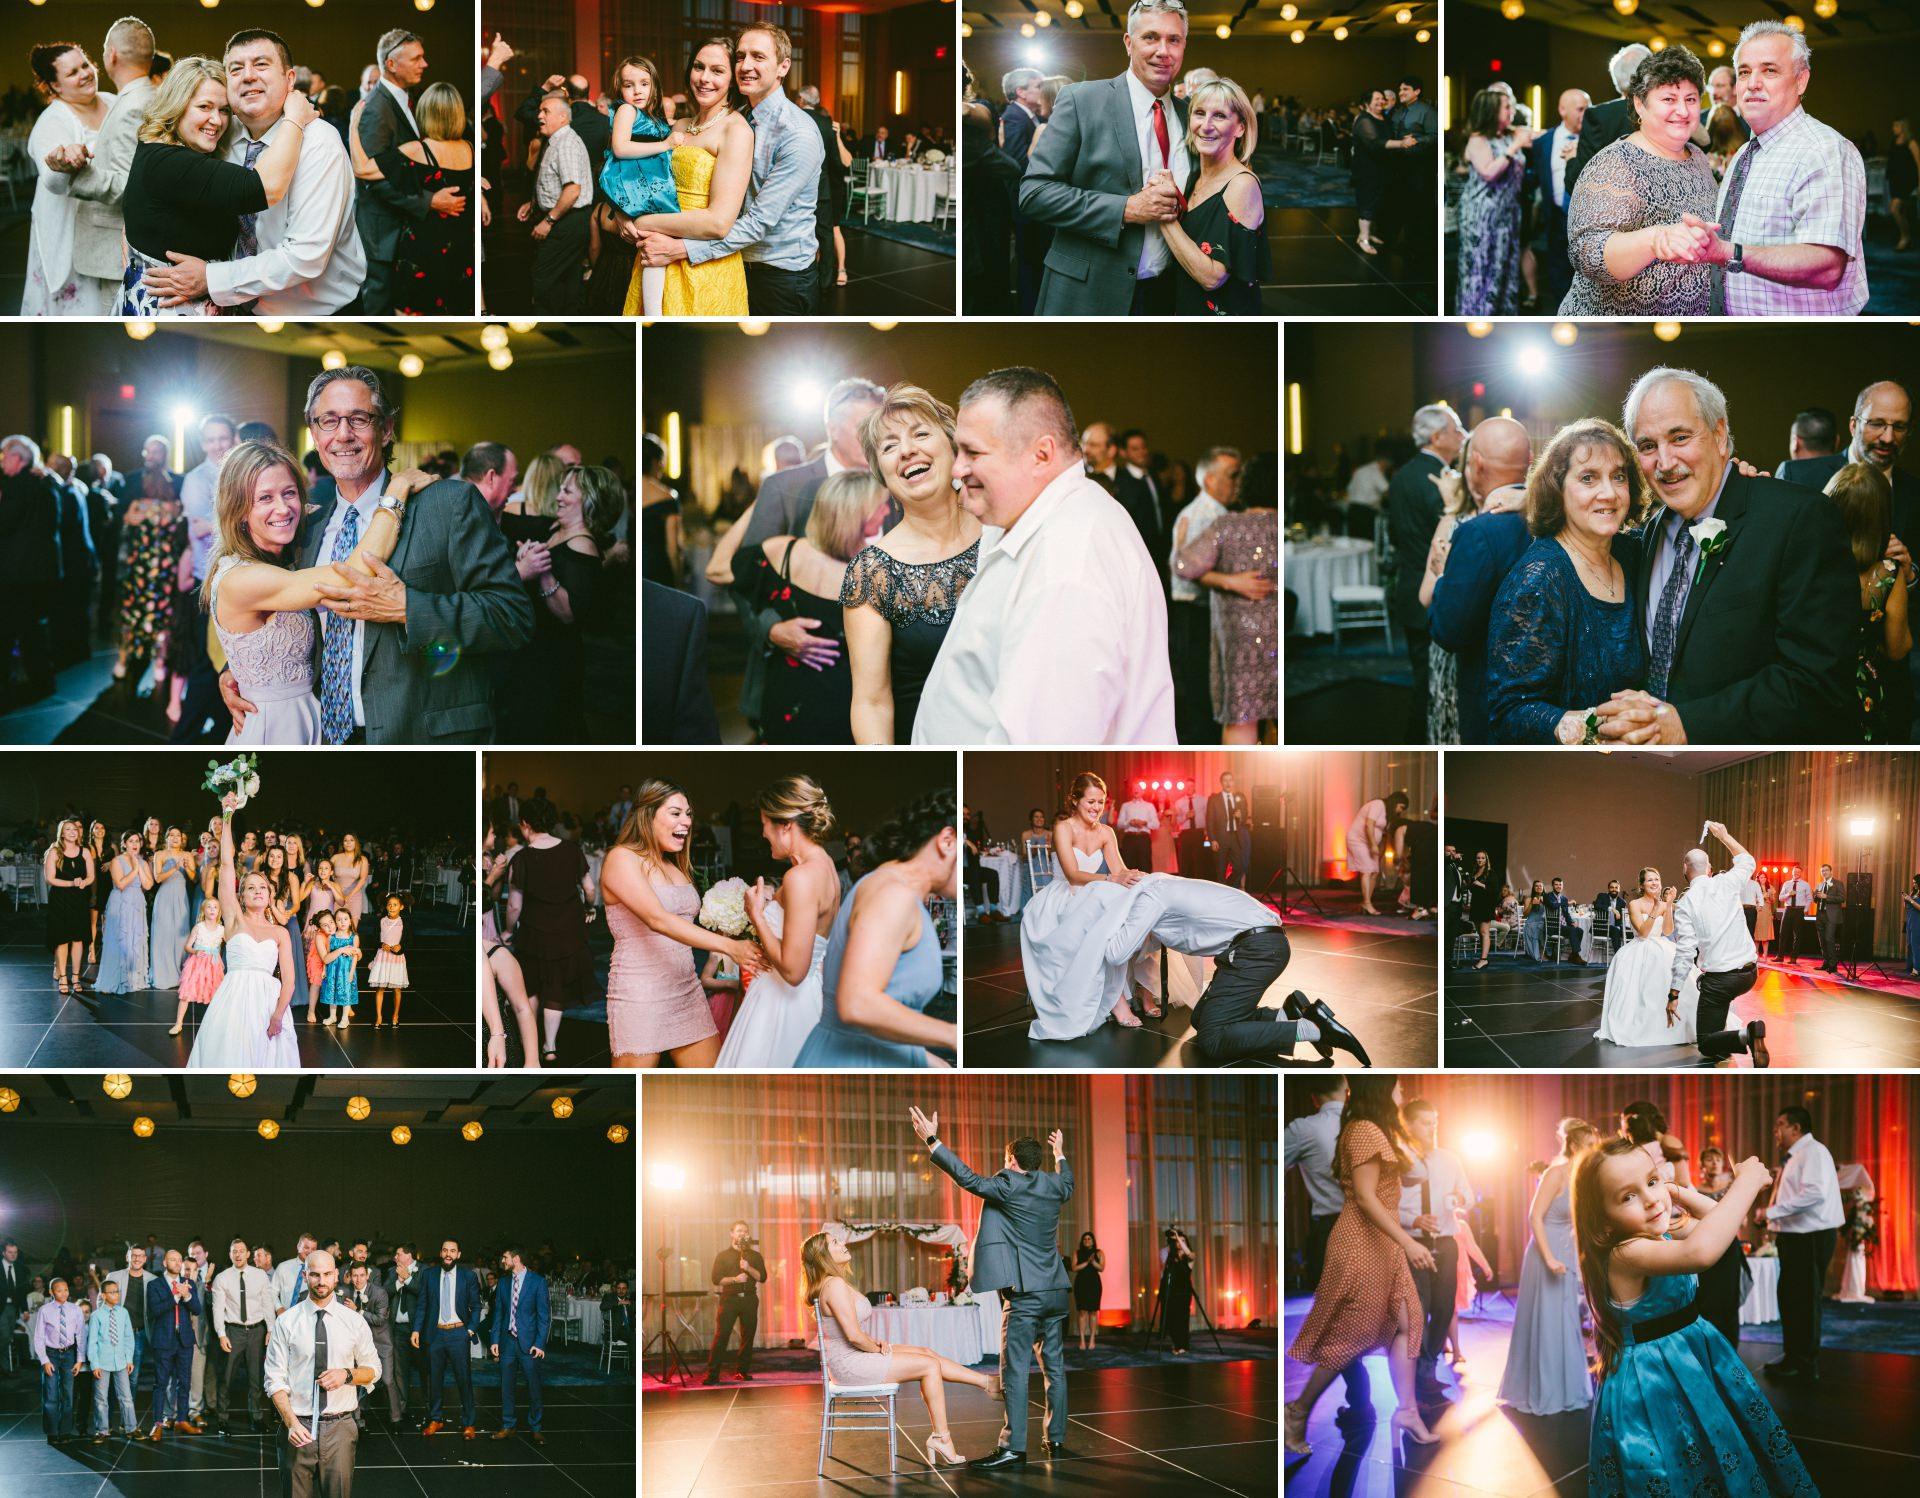 Dowtown Hilton Cleveland Wedding Photographer 2 35.jpg